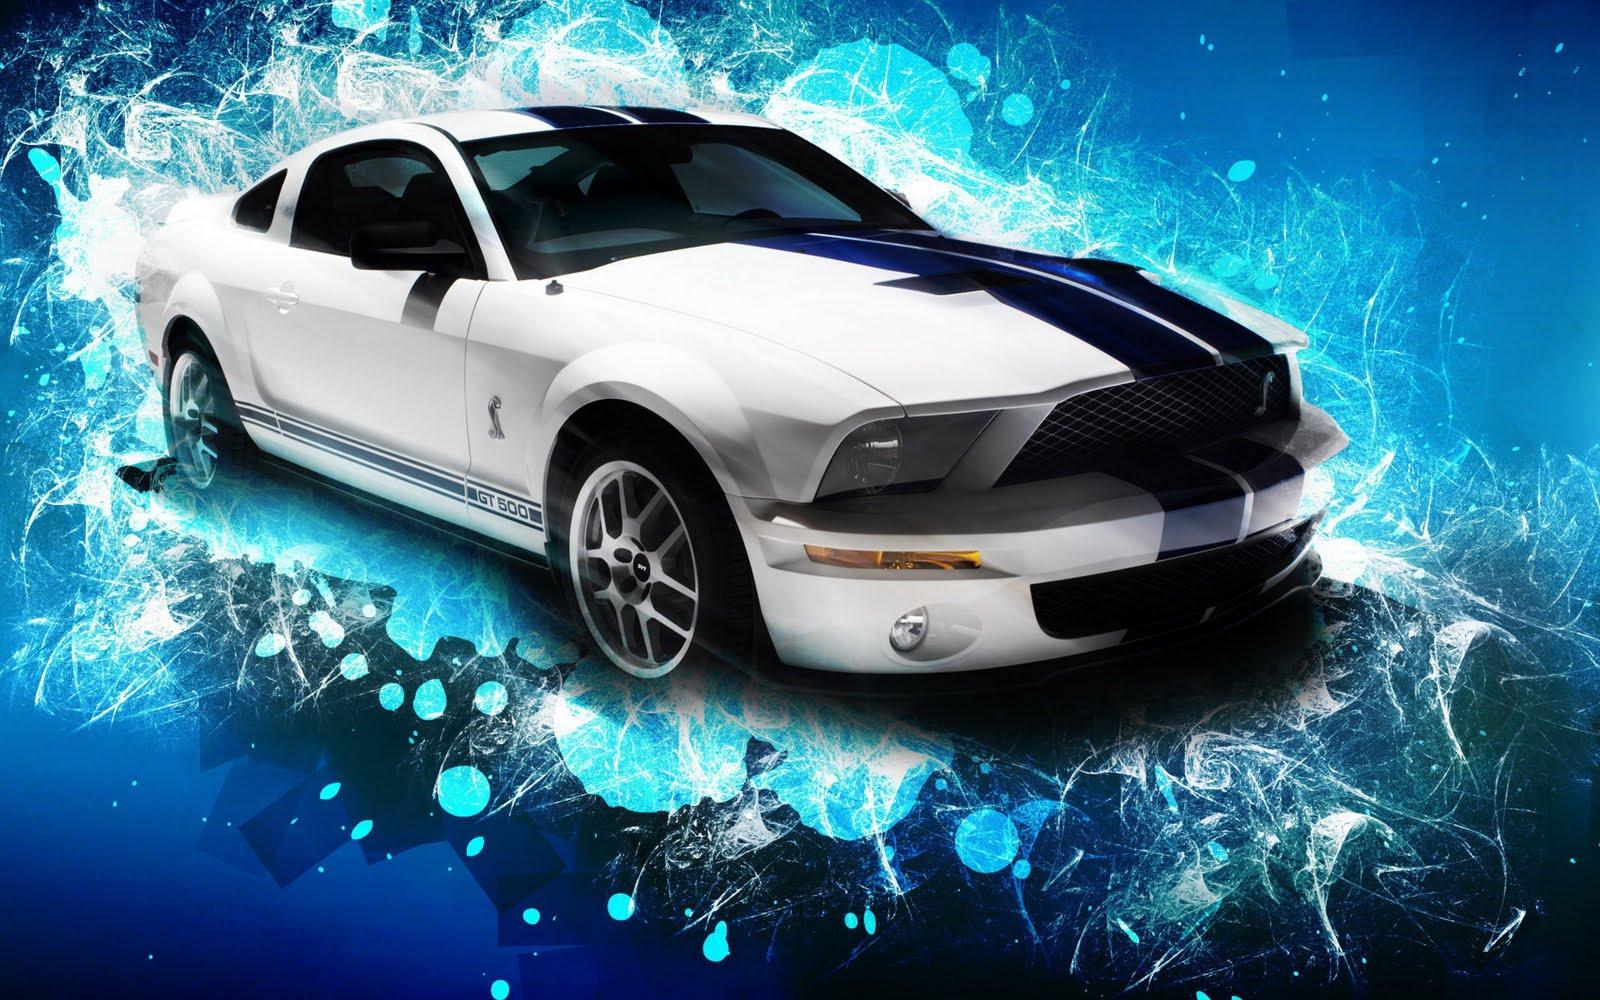 http://3.bp.blogspot.com/_vClfjdJc8Jk/TTwHxRNbJwI/AAAAAAAAE1A/0oVve1zHu7c/s1600/Hyundai-Veloster-Ford-Focus-Electric-Mercedes-Benz-honda-civic-toyota-latest-model-high-quality-wallpapers-jagodunya-jago-dunya-1600x1200-1920-1024-04.jpg